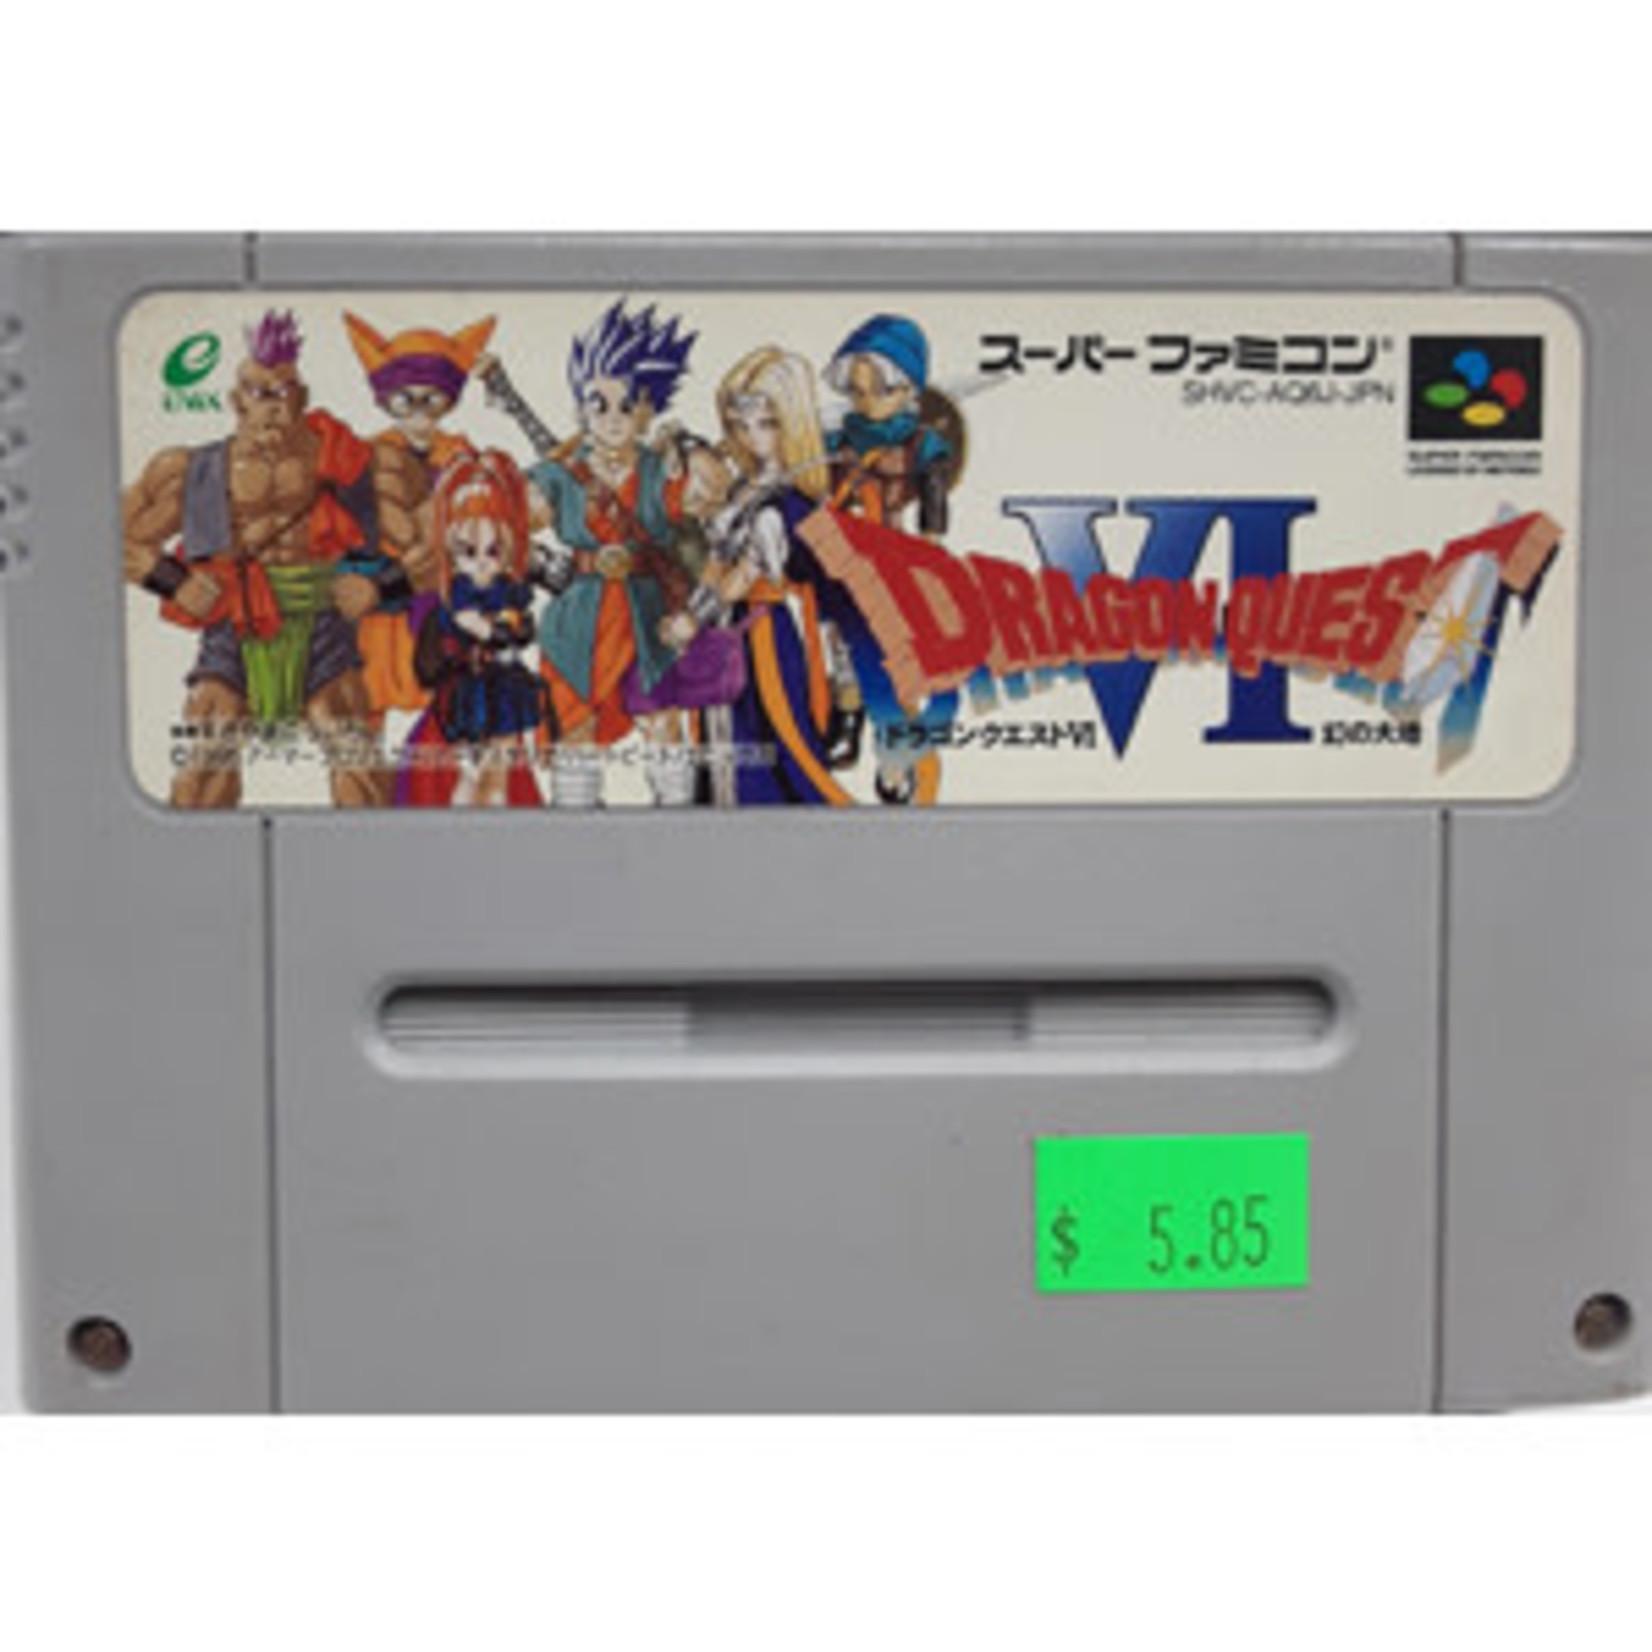 IMPORT-SFCU-Dragon Quest VI